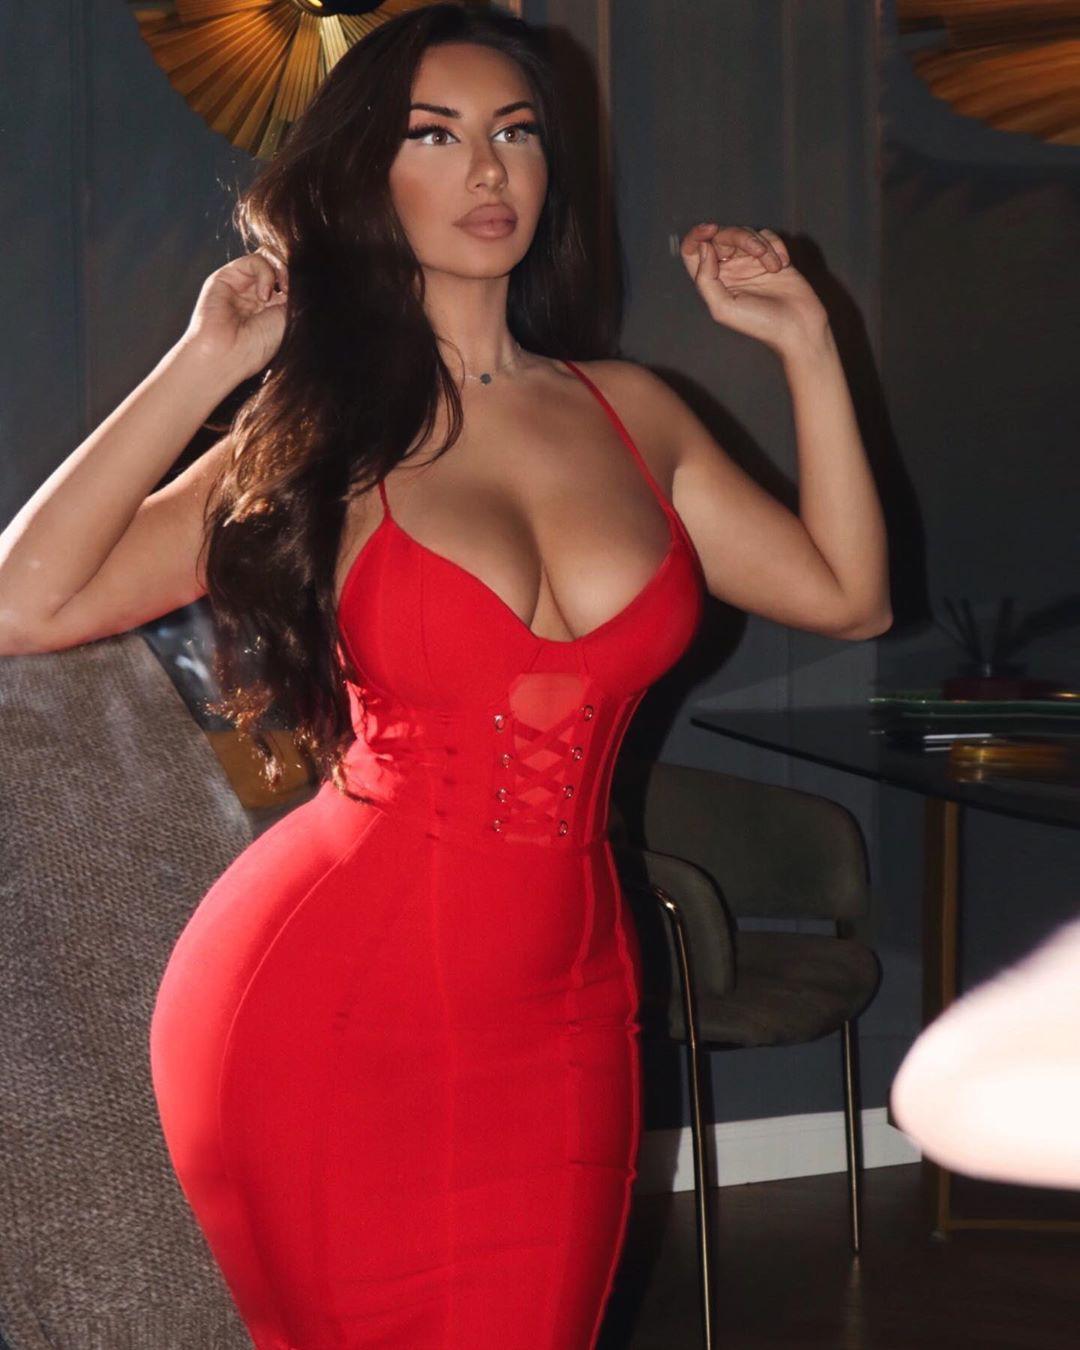 Anastazia strapless dress, cocktail dress matching style